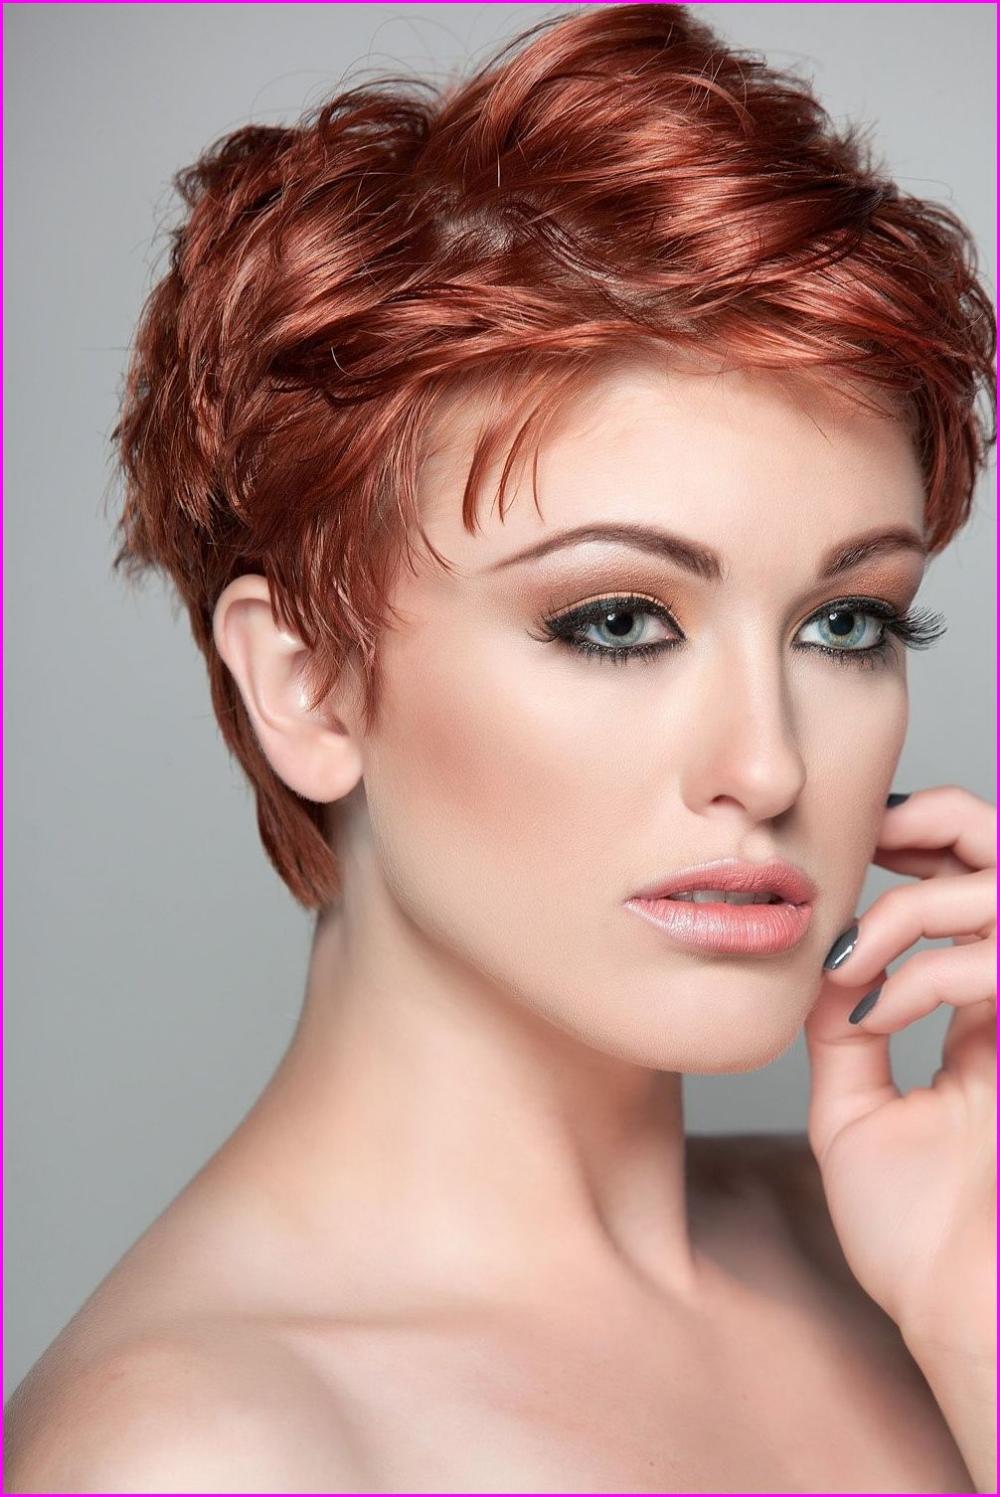 Pixie Haircuts for Fine Hair Over 50 | Short hair styles ...